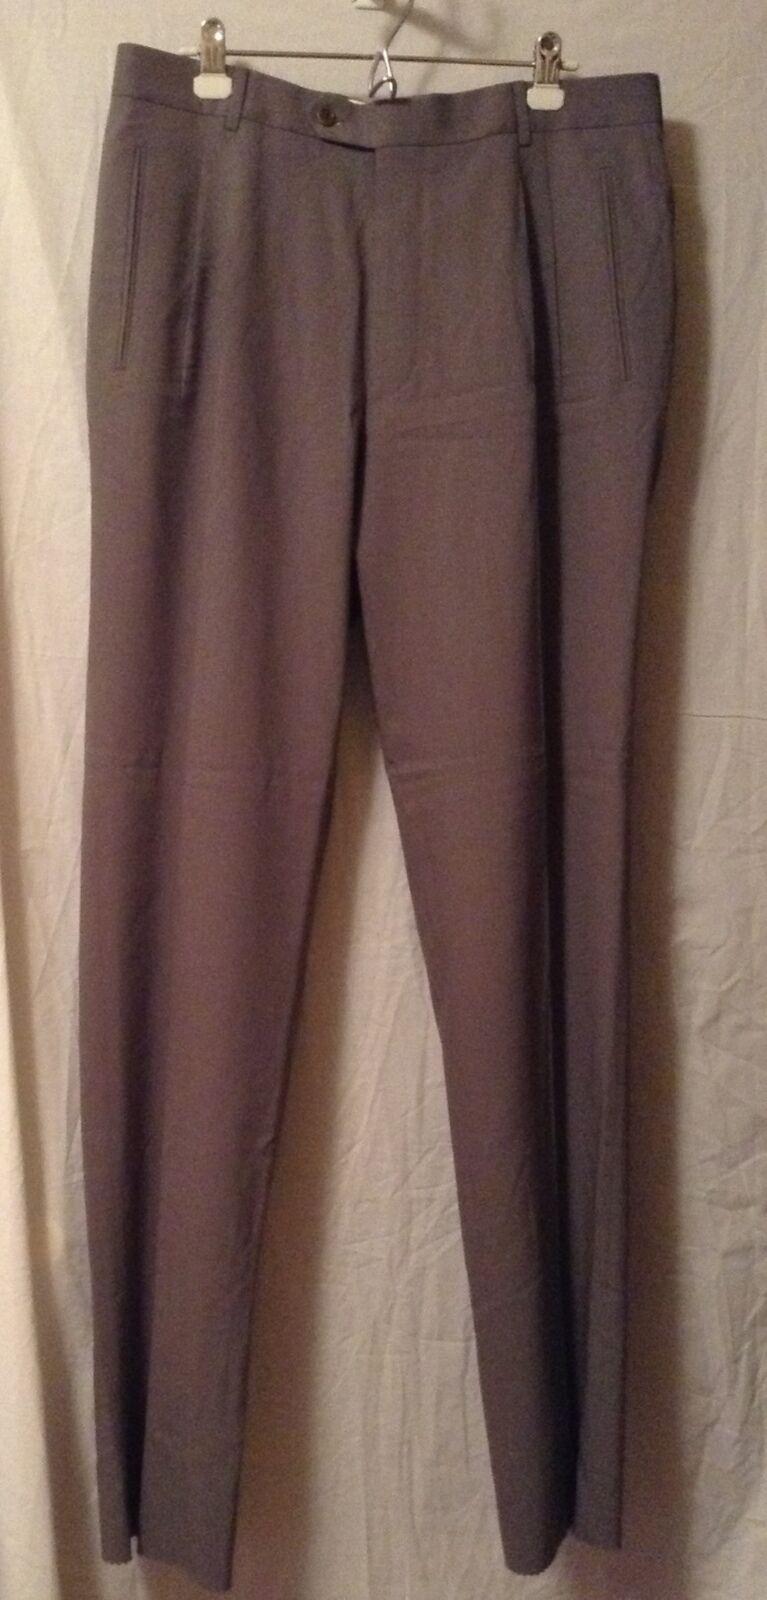 GREAT PAIR OF MEN'S HUGO BOSS 100% WOOL DRESS PANTS OLIVE GREEN- SZ 36 - NWOTGS